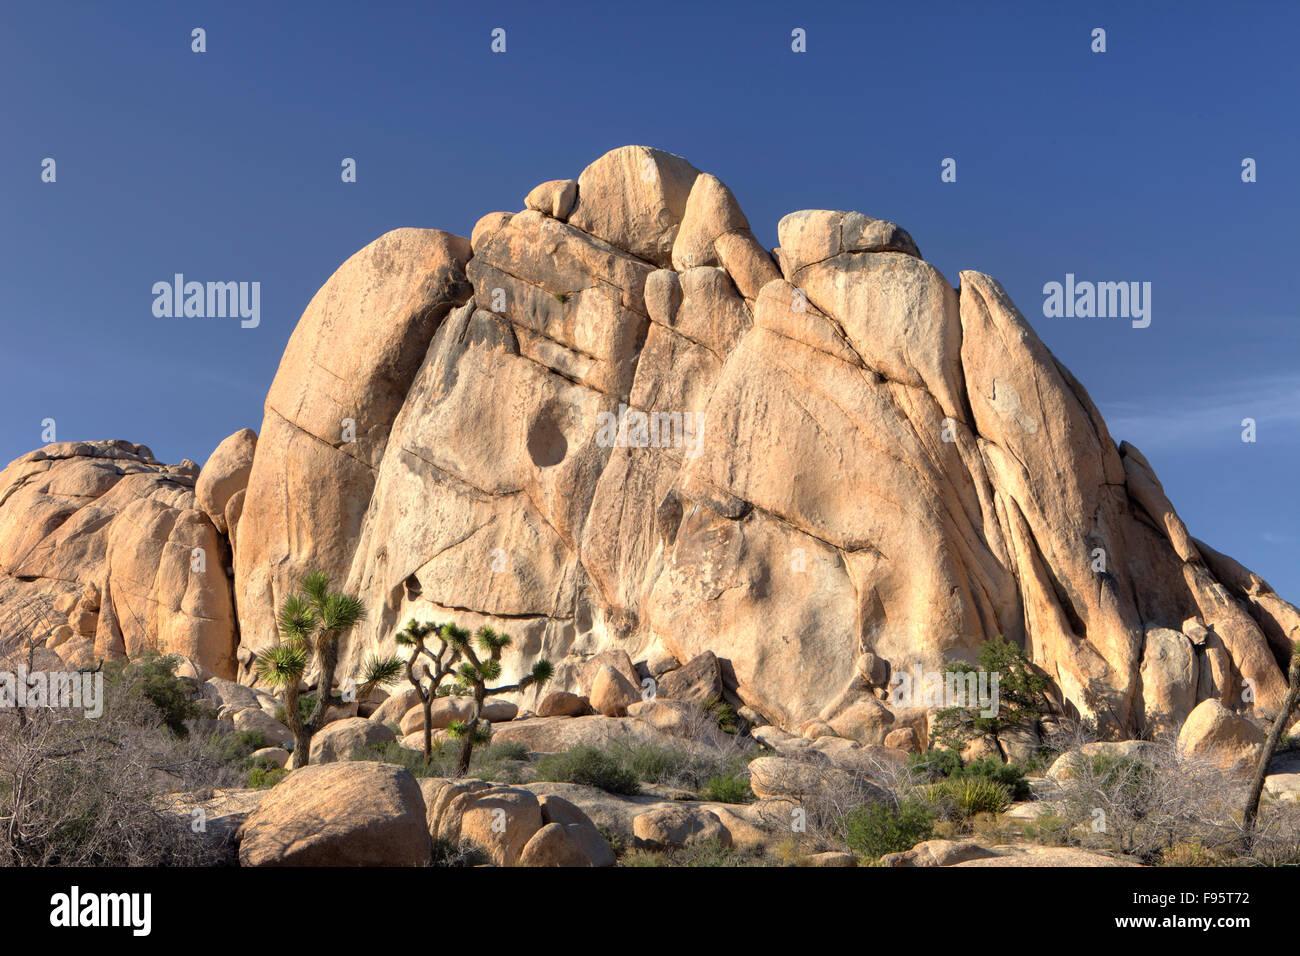 Rock Formations, Joshua Tree National Park, Calif. USA - Stock Image